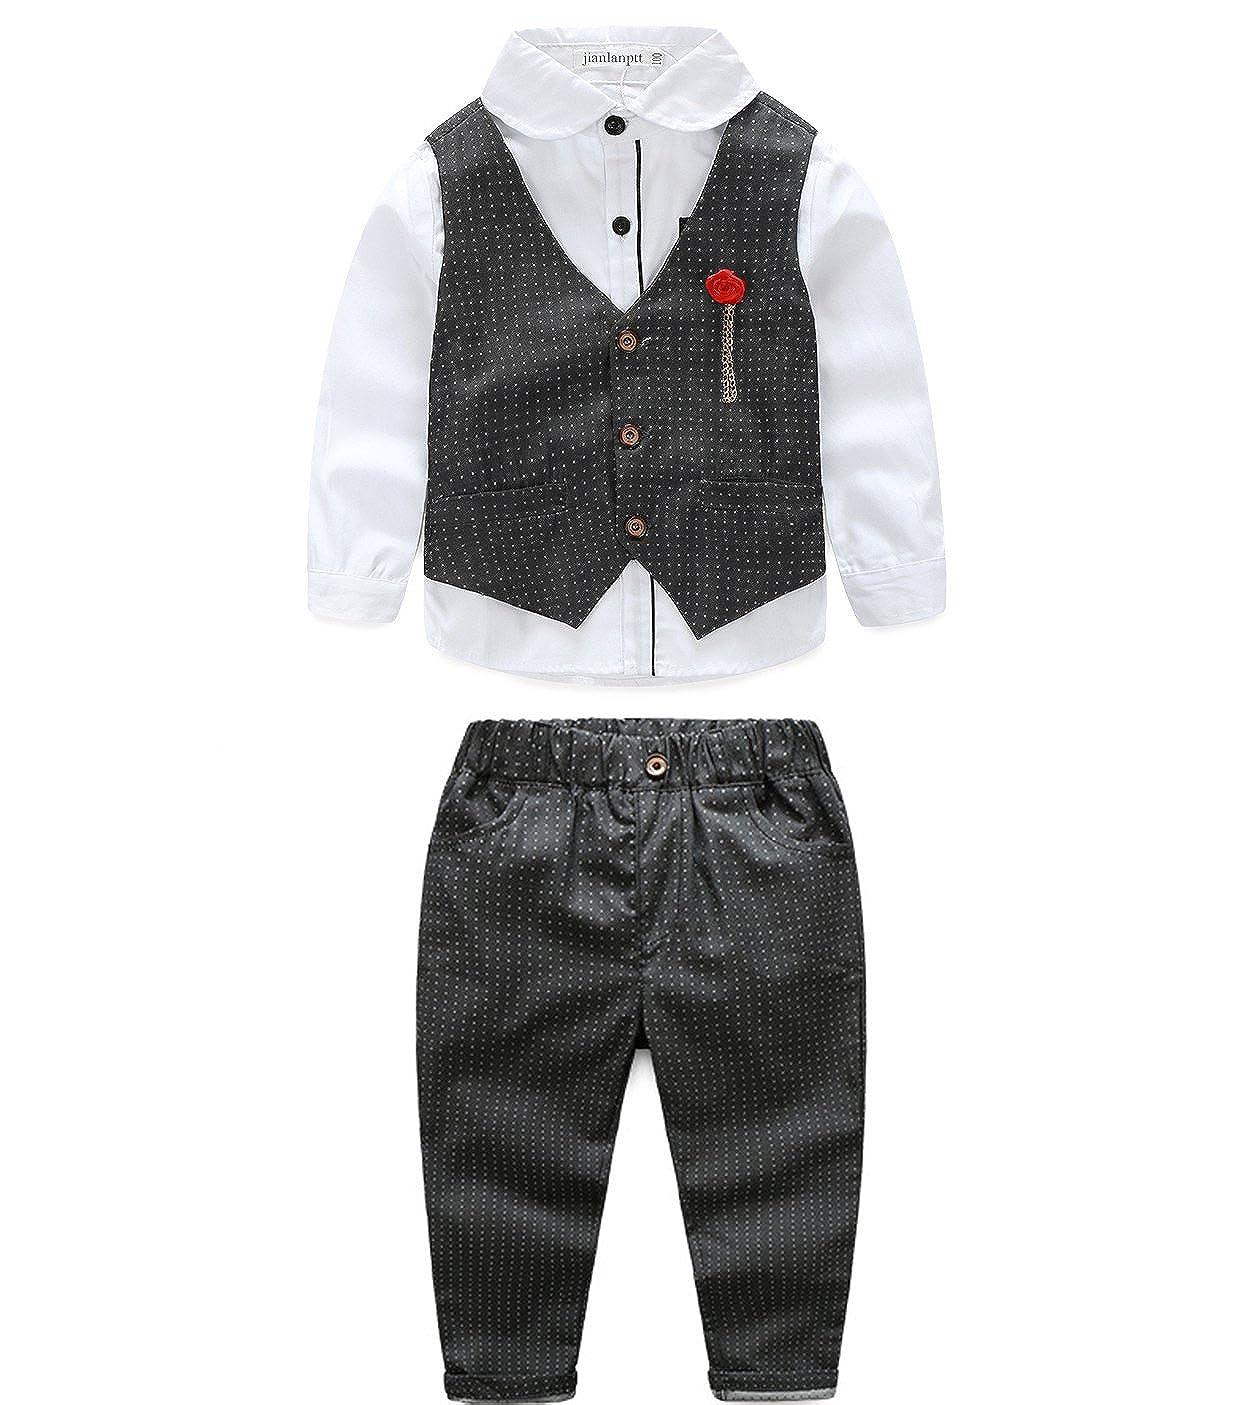 422359345 JIANLANPTT 3Pcs Set Clothing Set Kids Gentleman Boy Suit Shirt Vest Casual  Pants